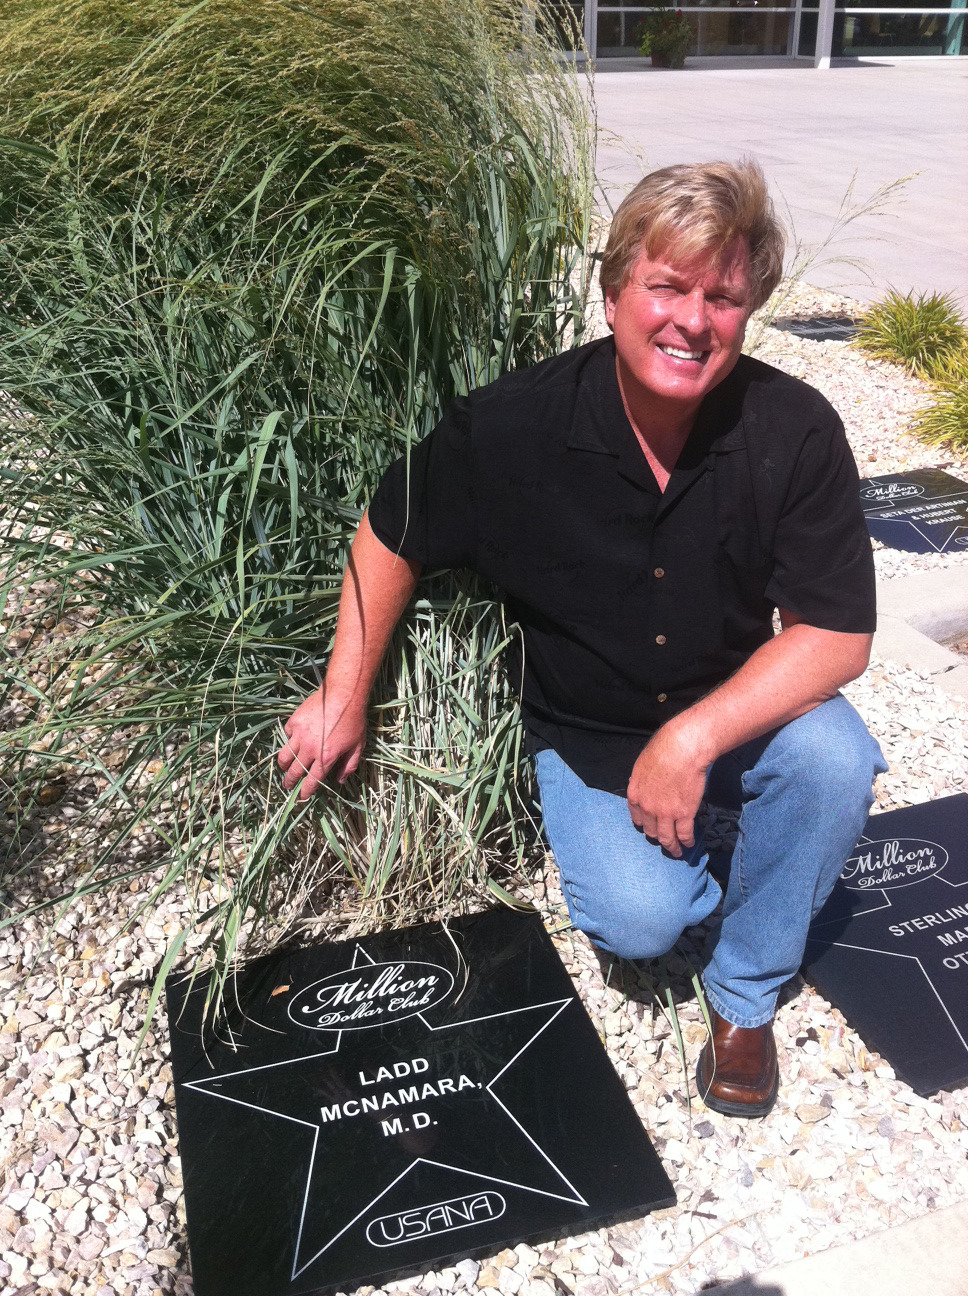 Dr. Ladd McNamara Million Dollar Star